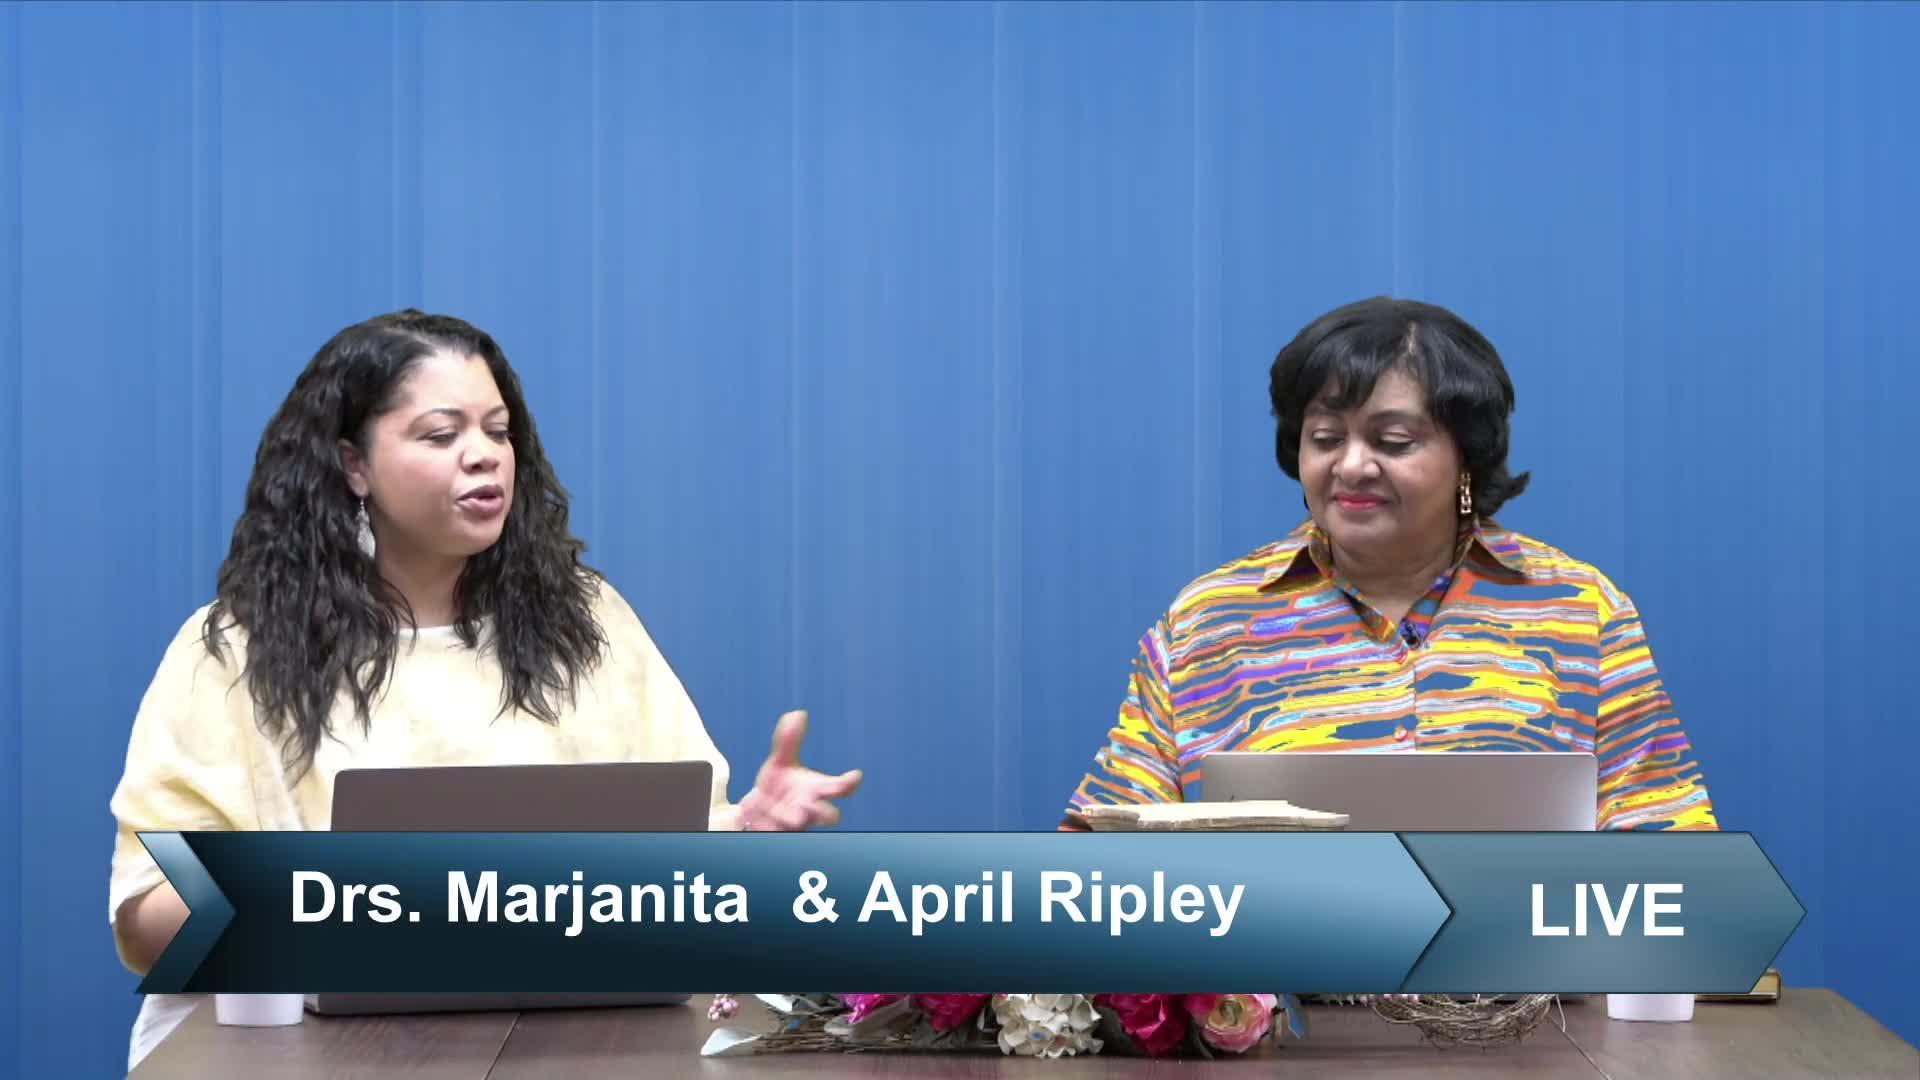 Skills to Thrive In Life-Drs. Marjanita & April Ripley- Wed. May 19, 2021@ 7:30PM